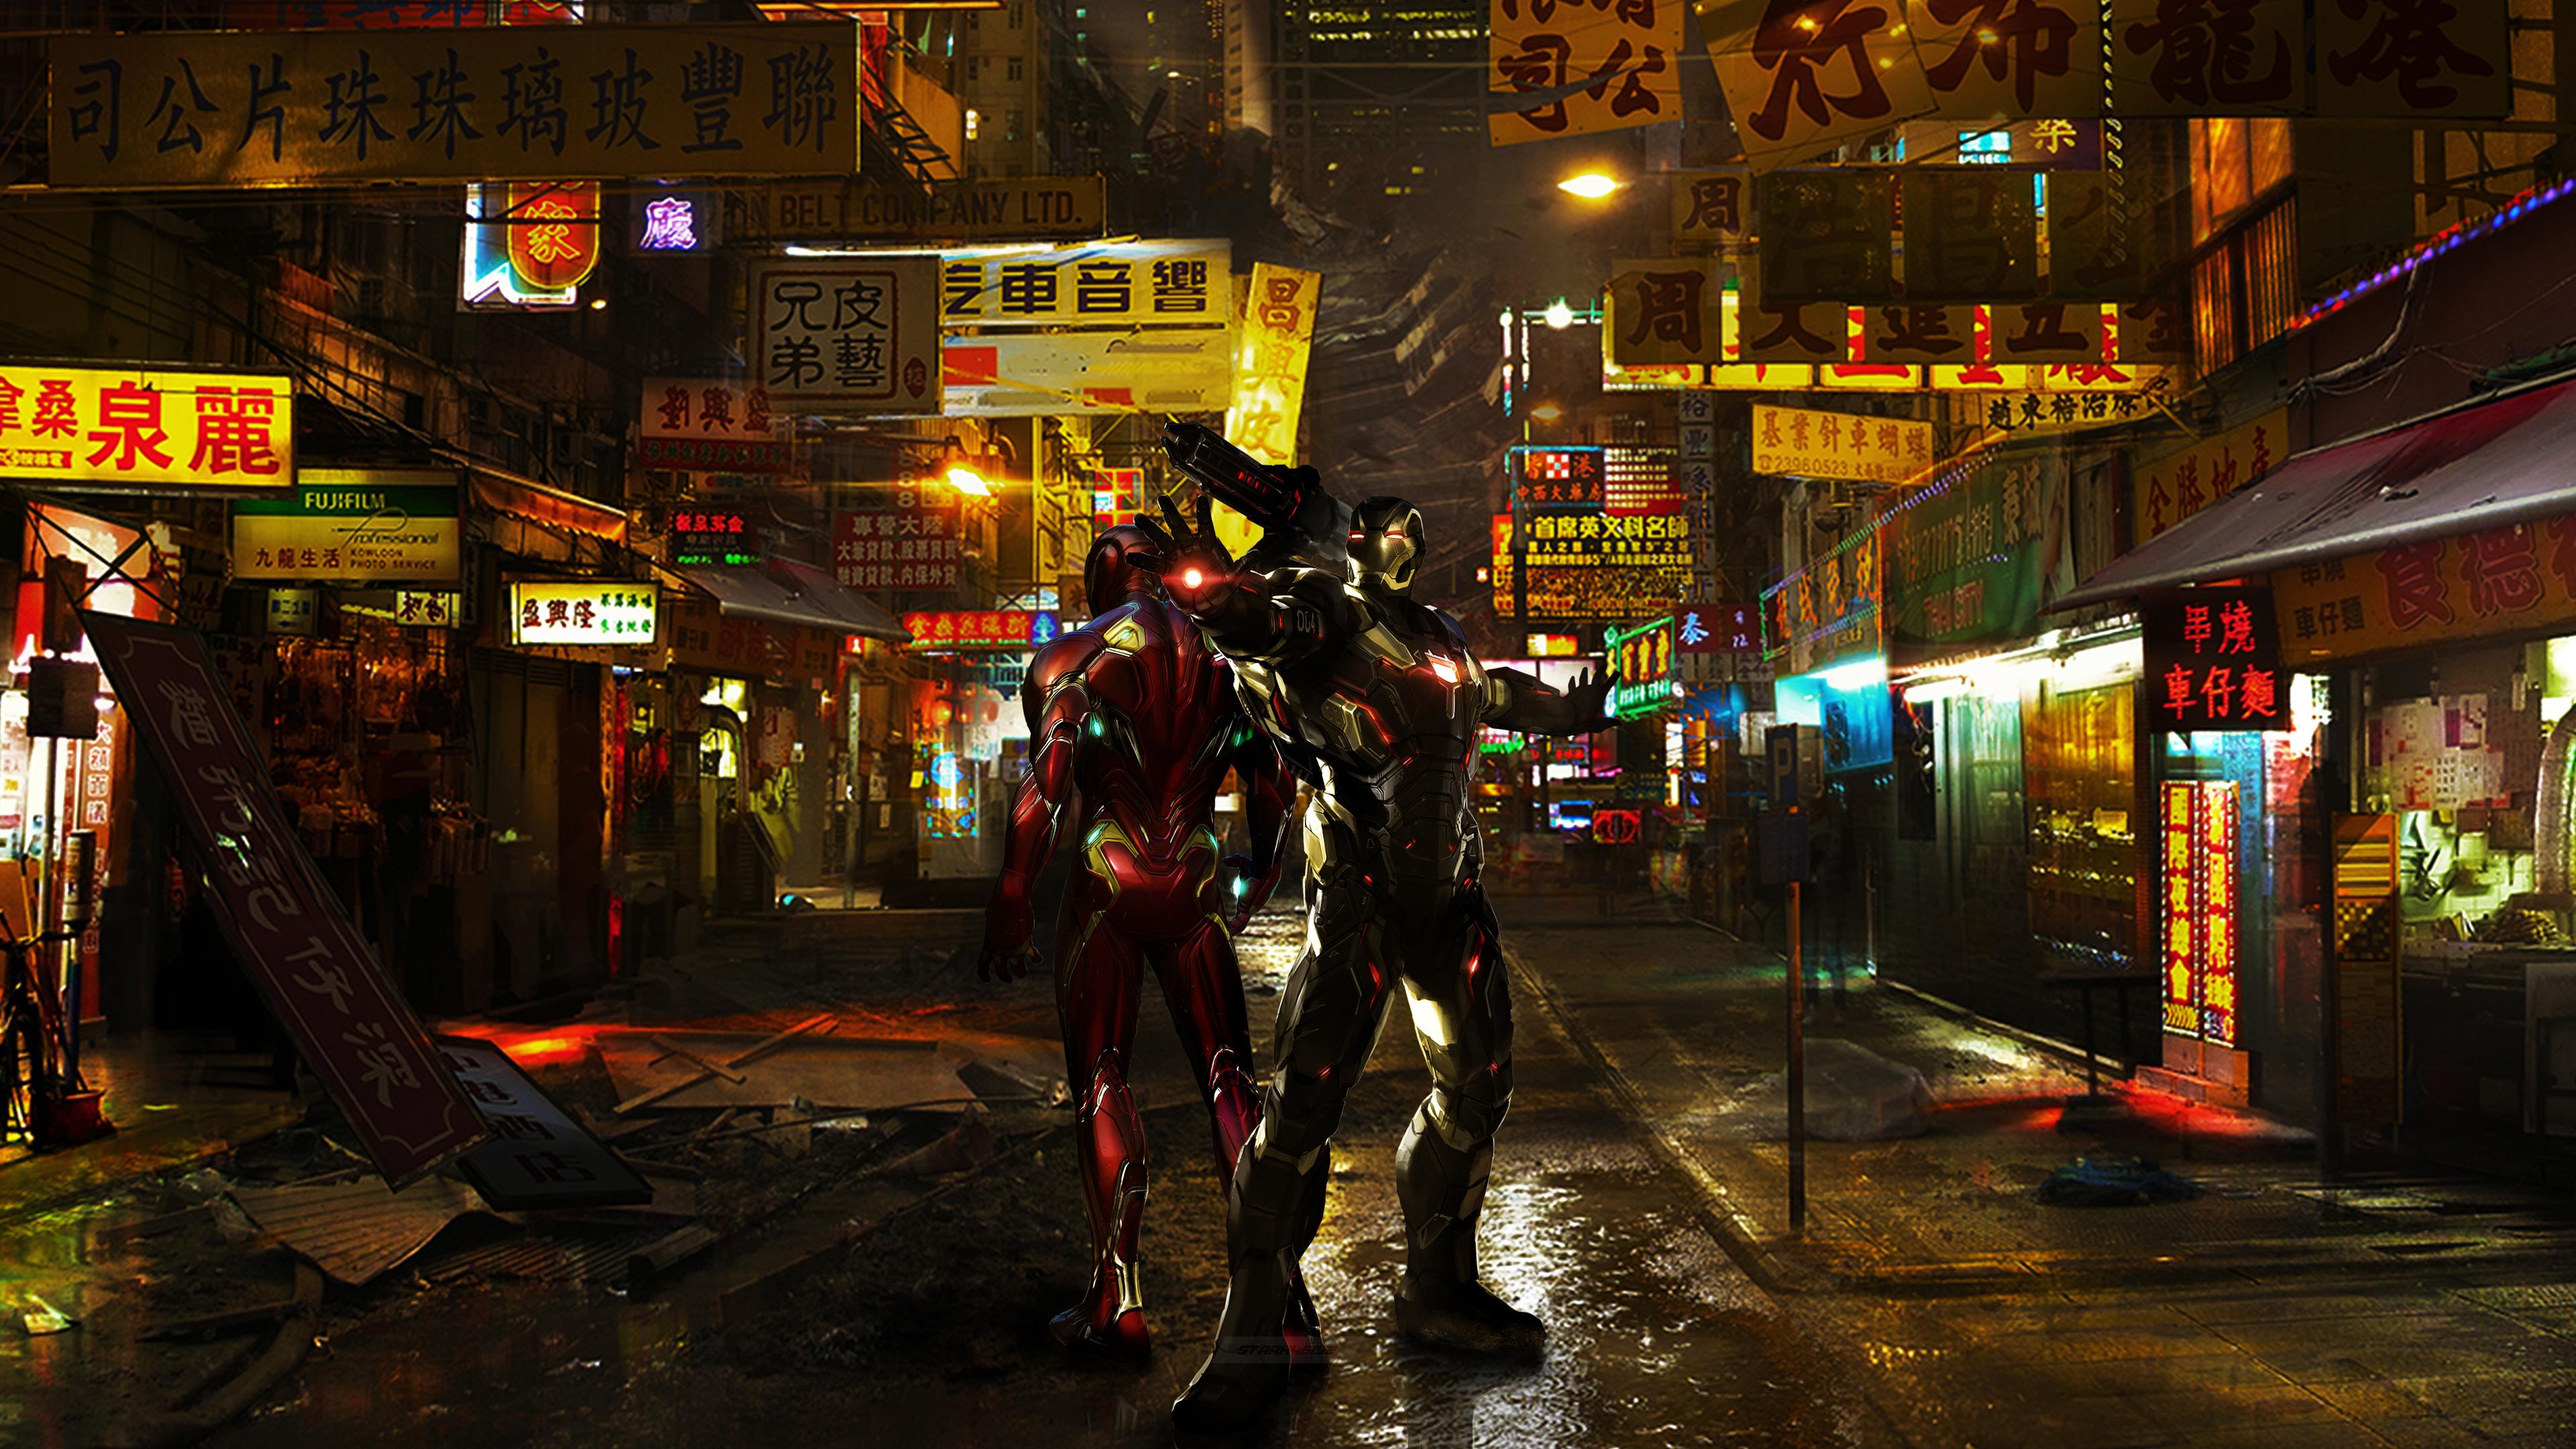 1280x1280 Car Wallpaper Iron Man And War Machine 4k War Machine Wallpapers